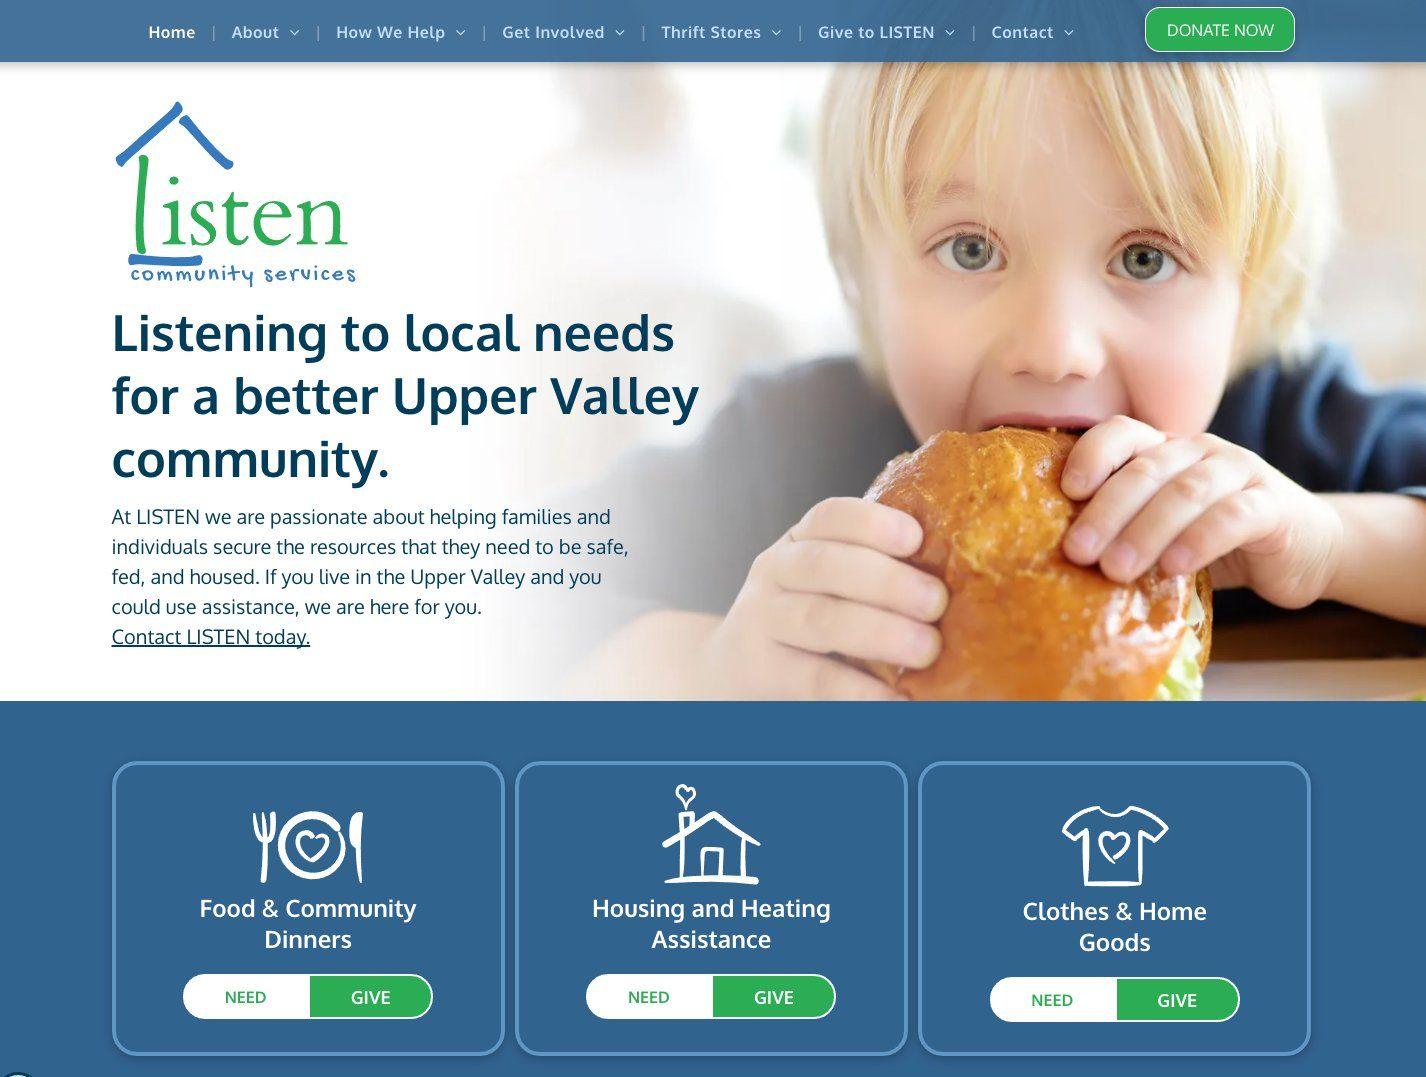 LISTEN Community Services Launches New Web Presence